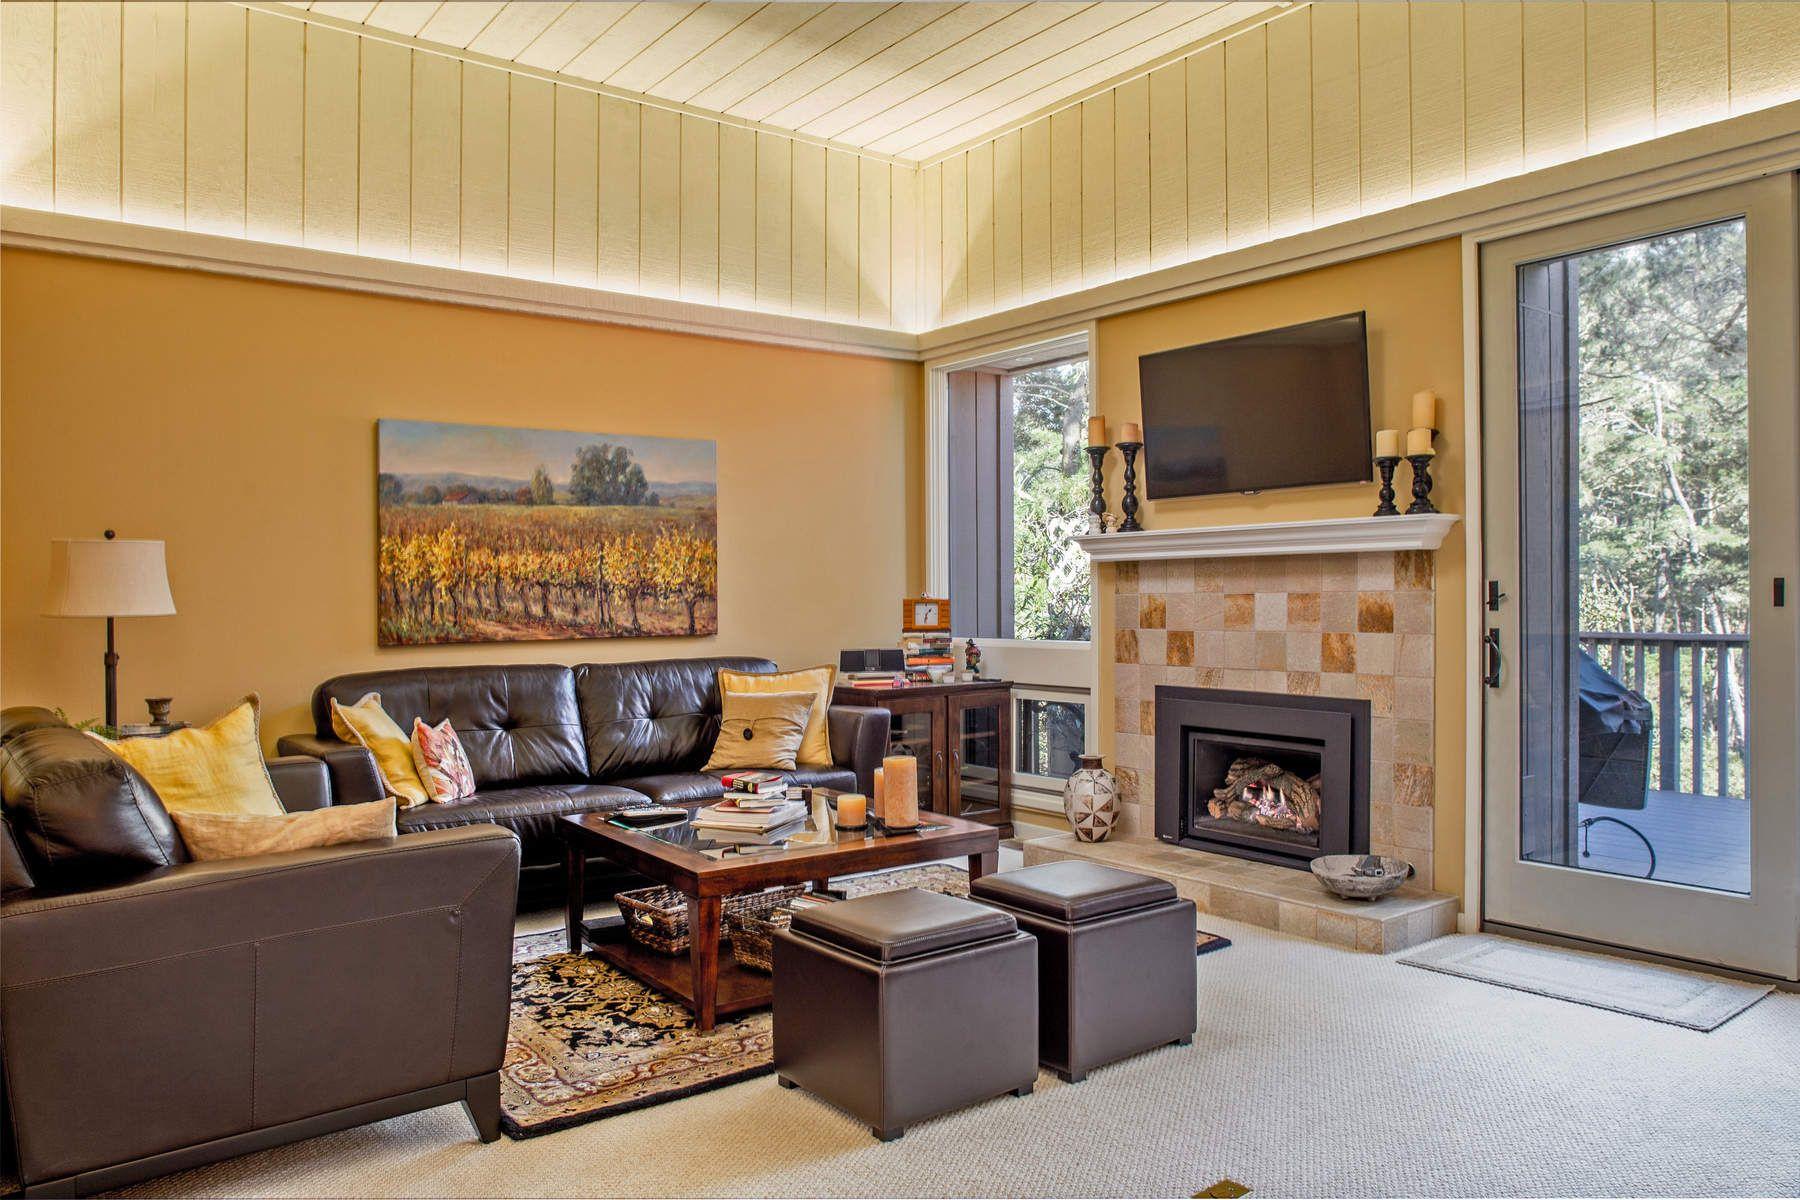 شقة بعمارة للـ Sale في 24501 Via Mar Monte #58 24501 Via Mar Monte #58 Carmel, California 93923 United States